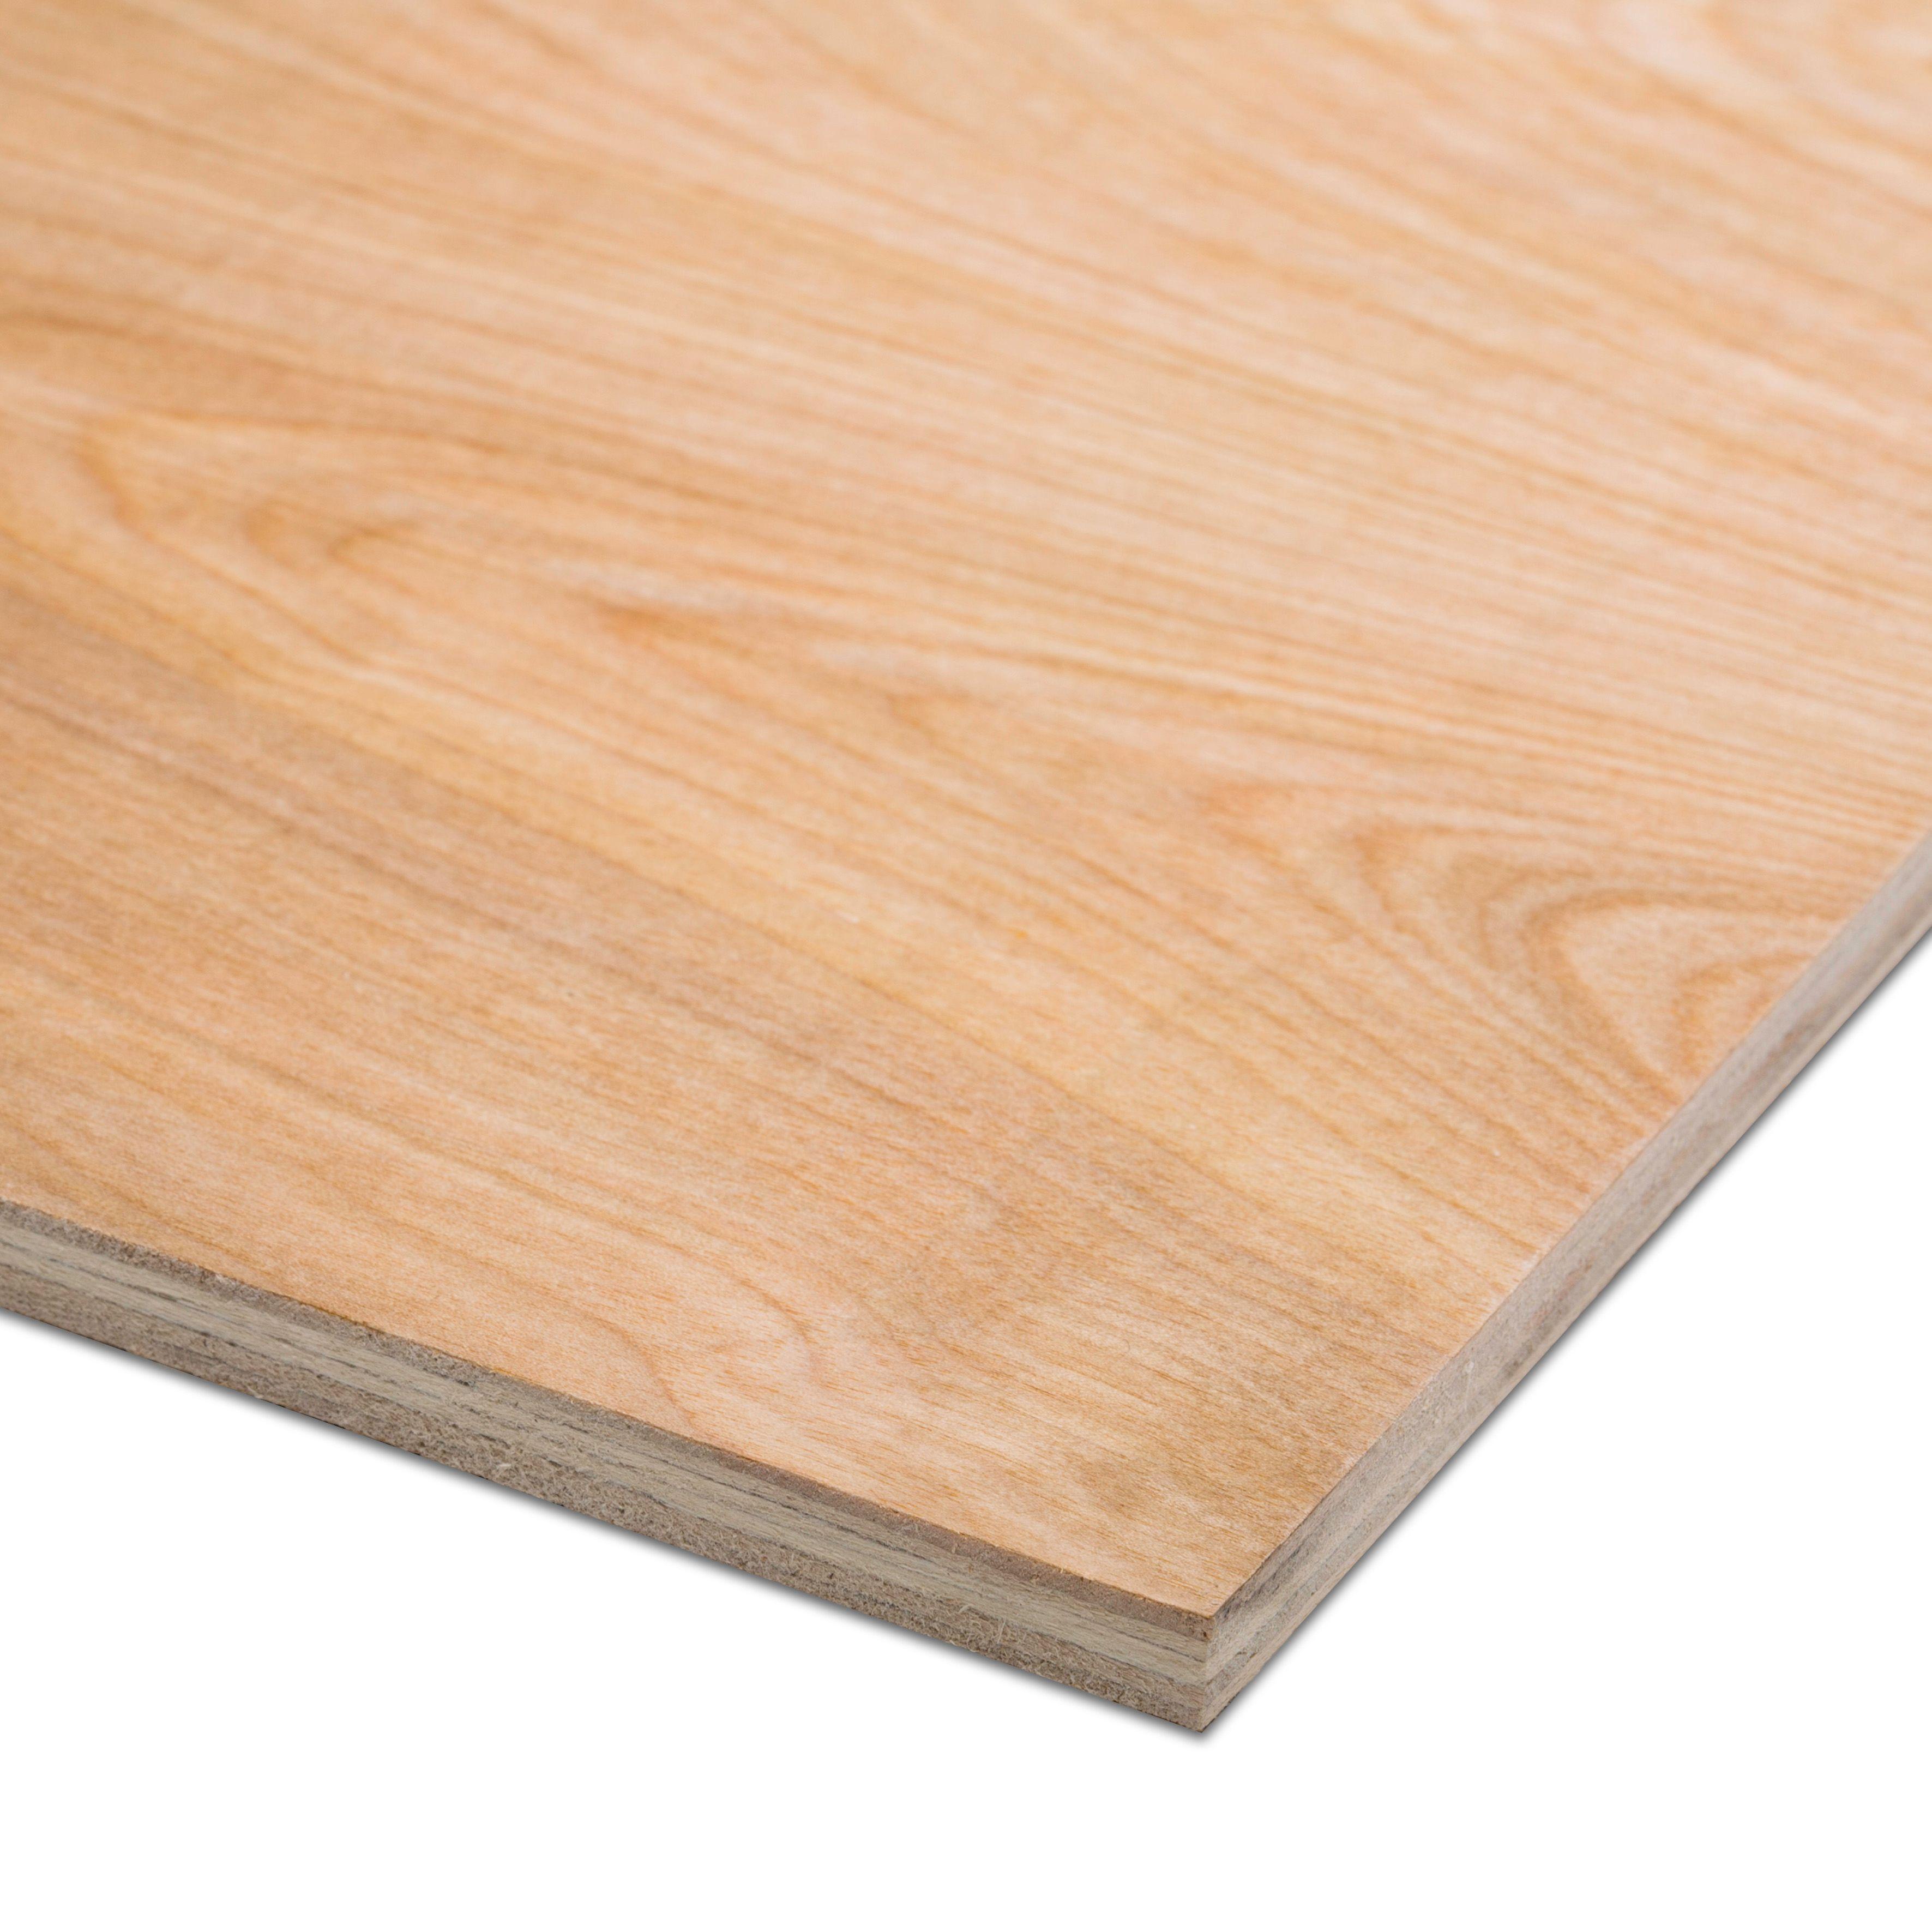 Hardwood plywood th mm w l departments